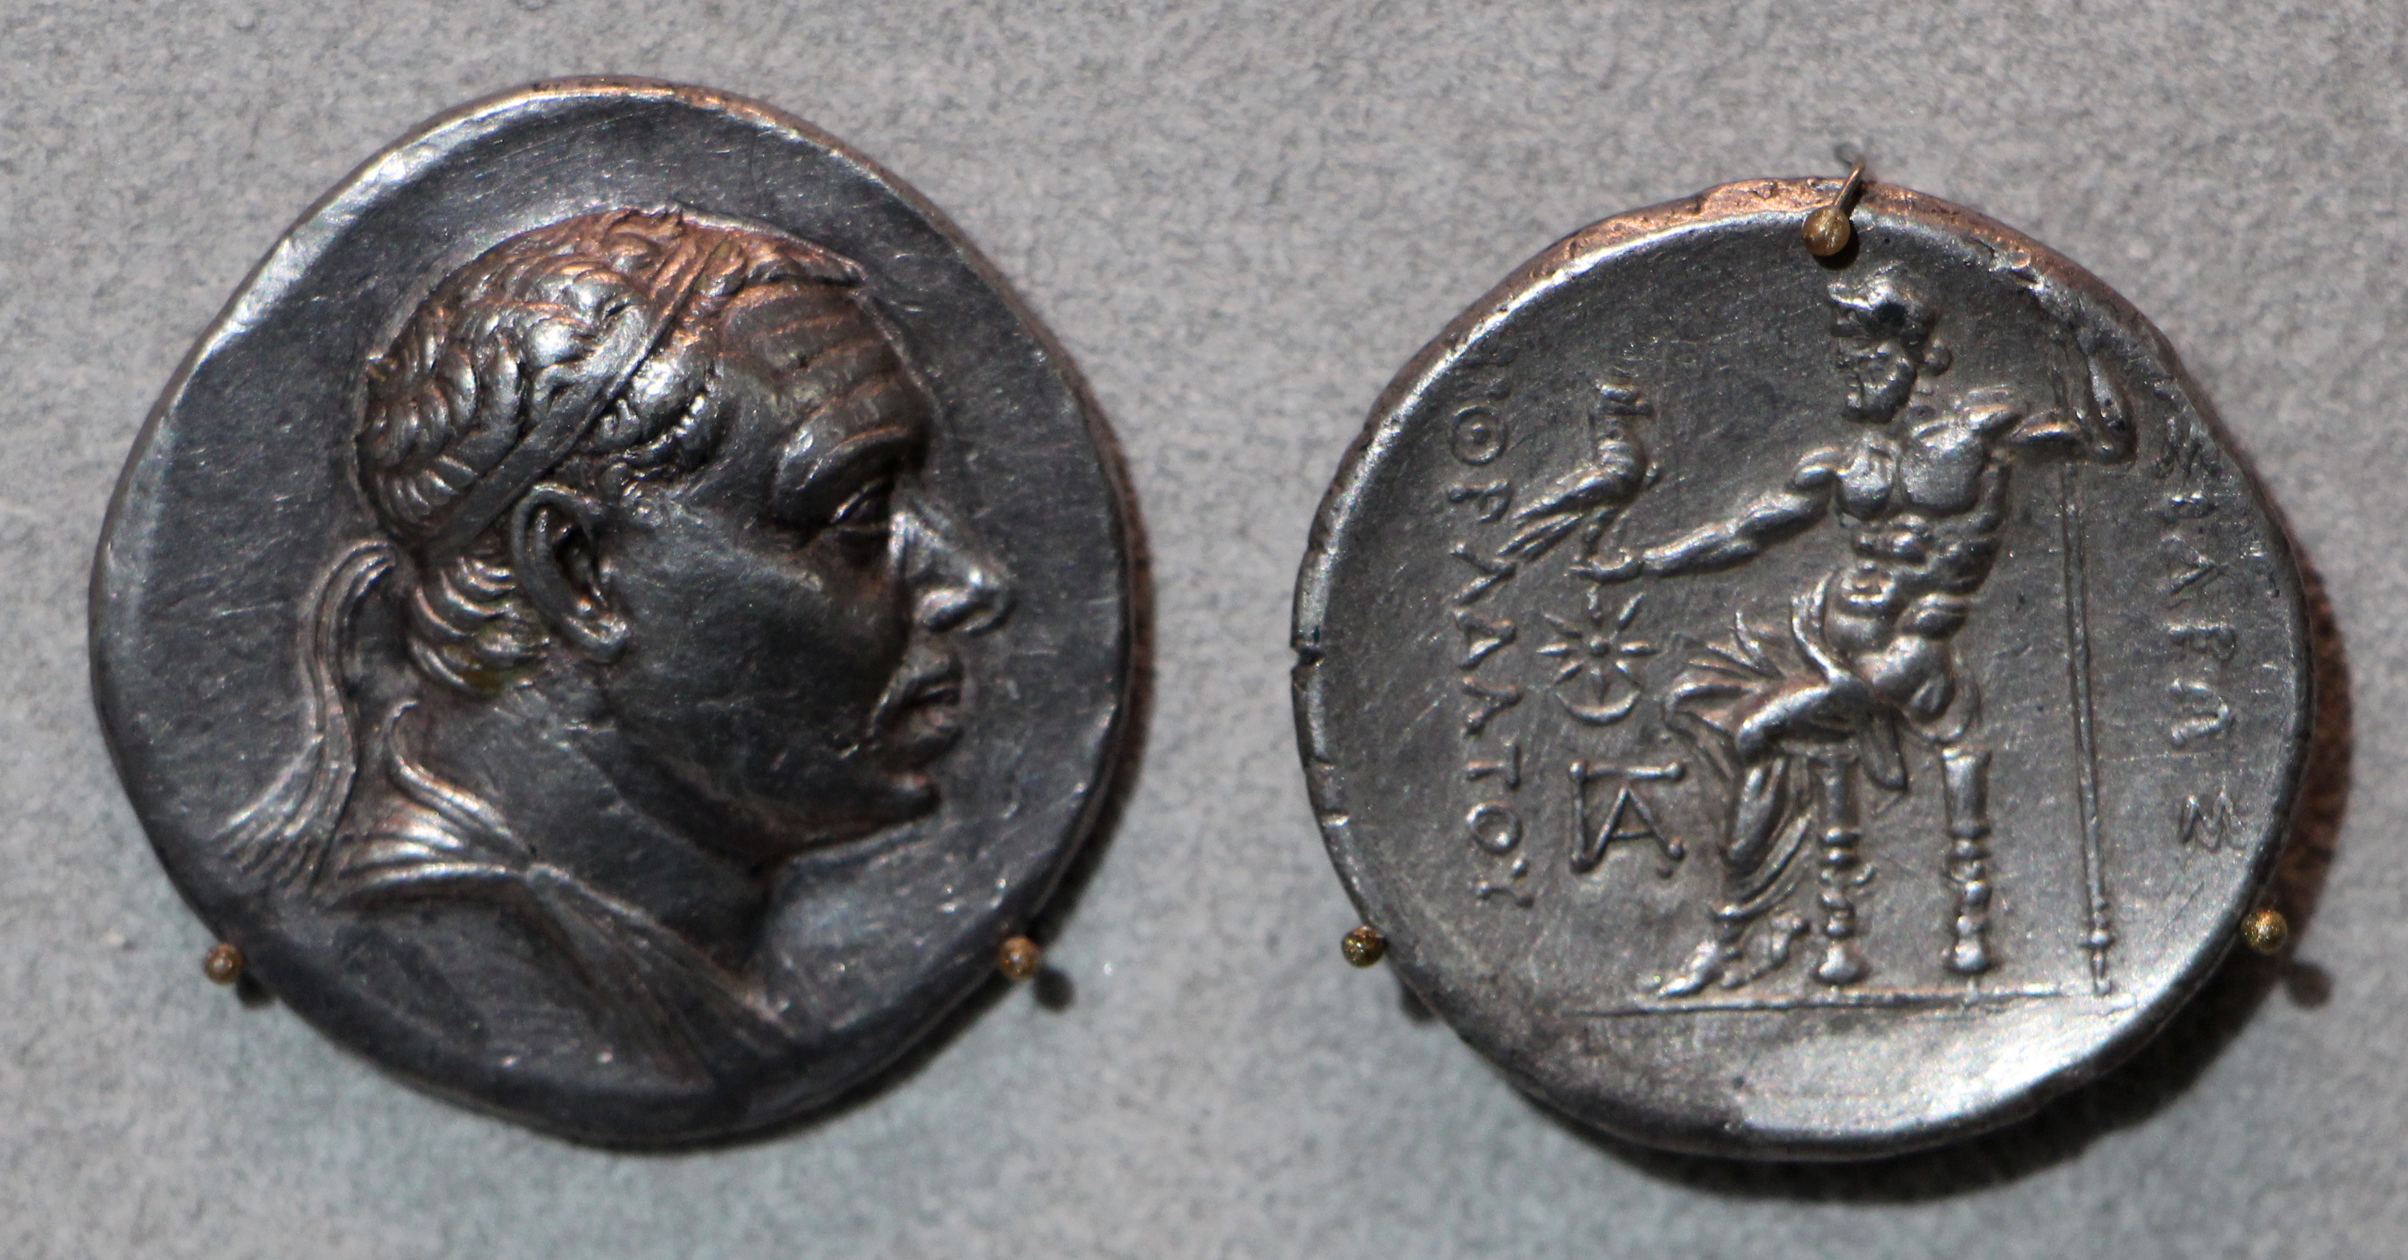 Mithridates III of Pontus